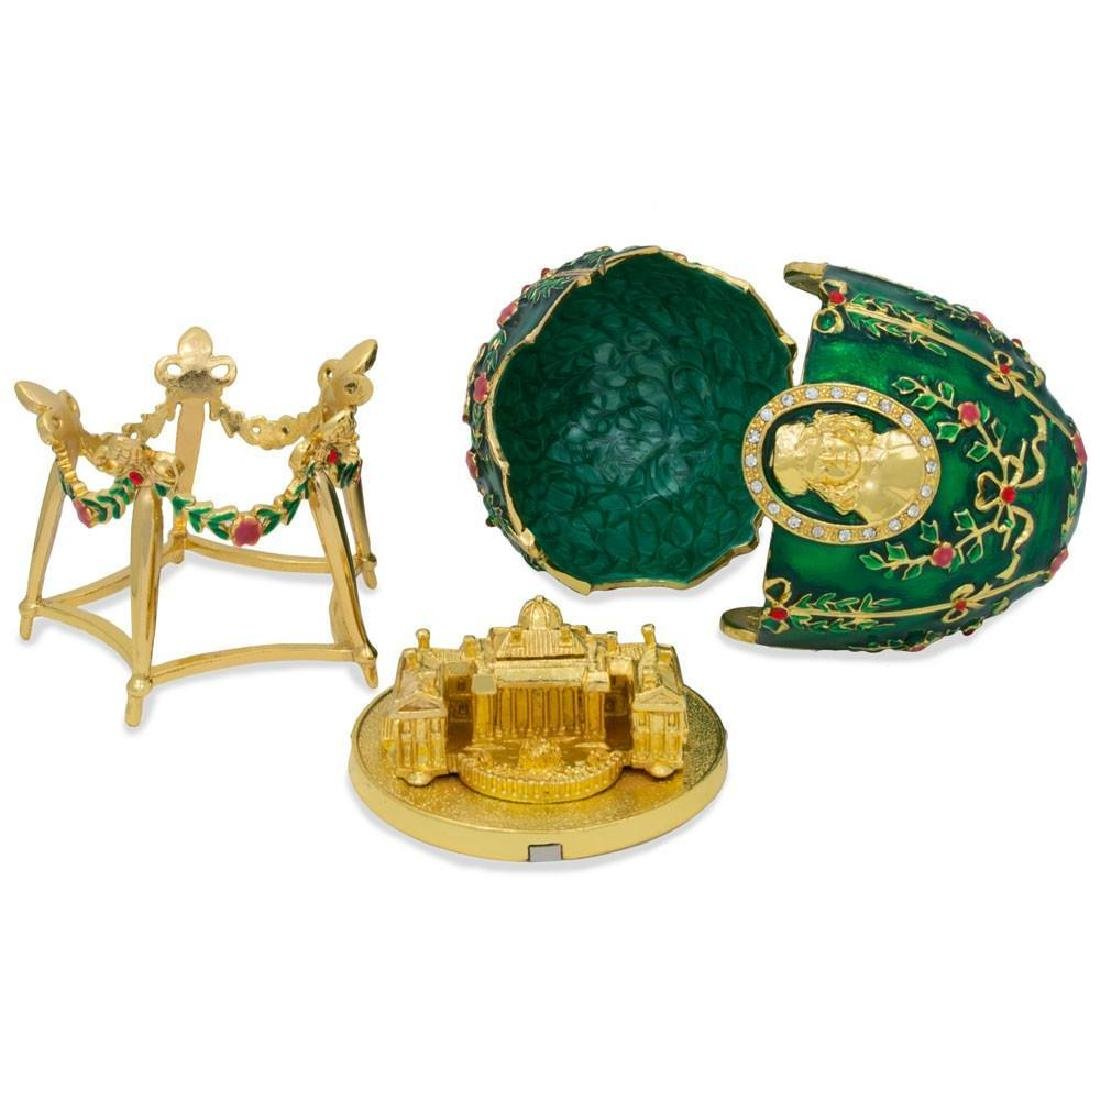 Faberge Inspired 1908 Alexander Palace Faberge Egg - 5